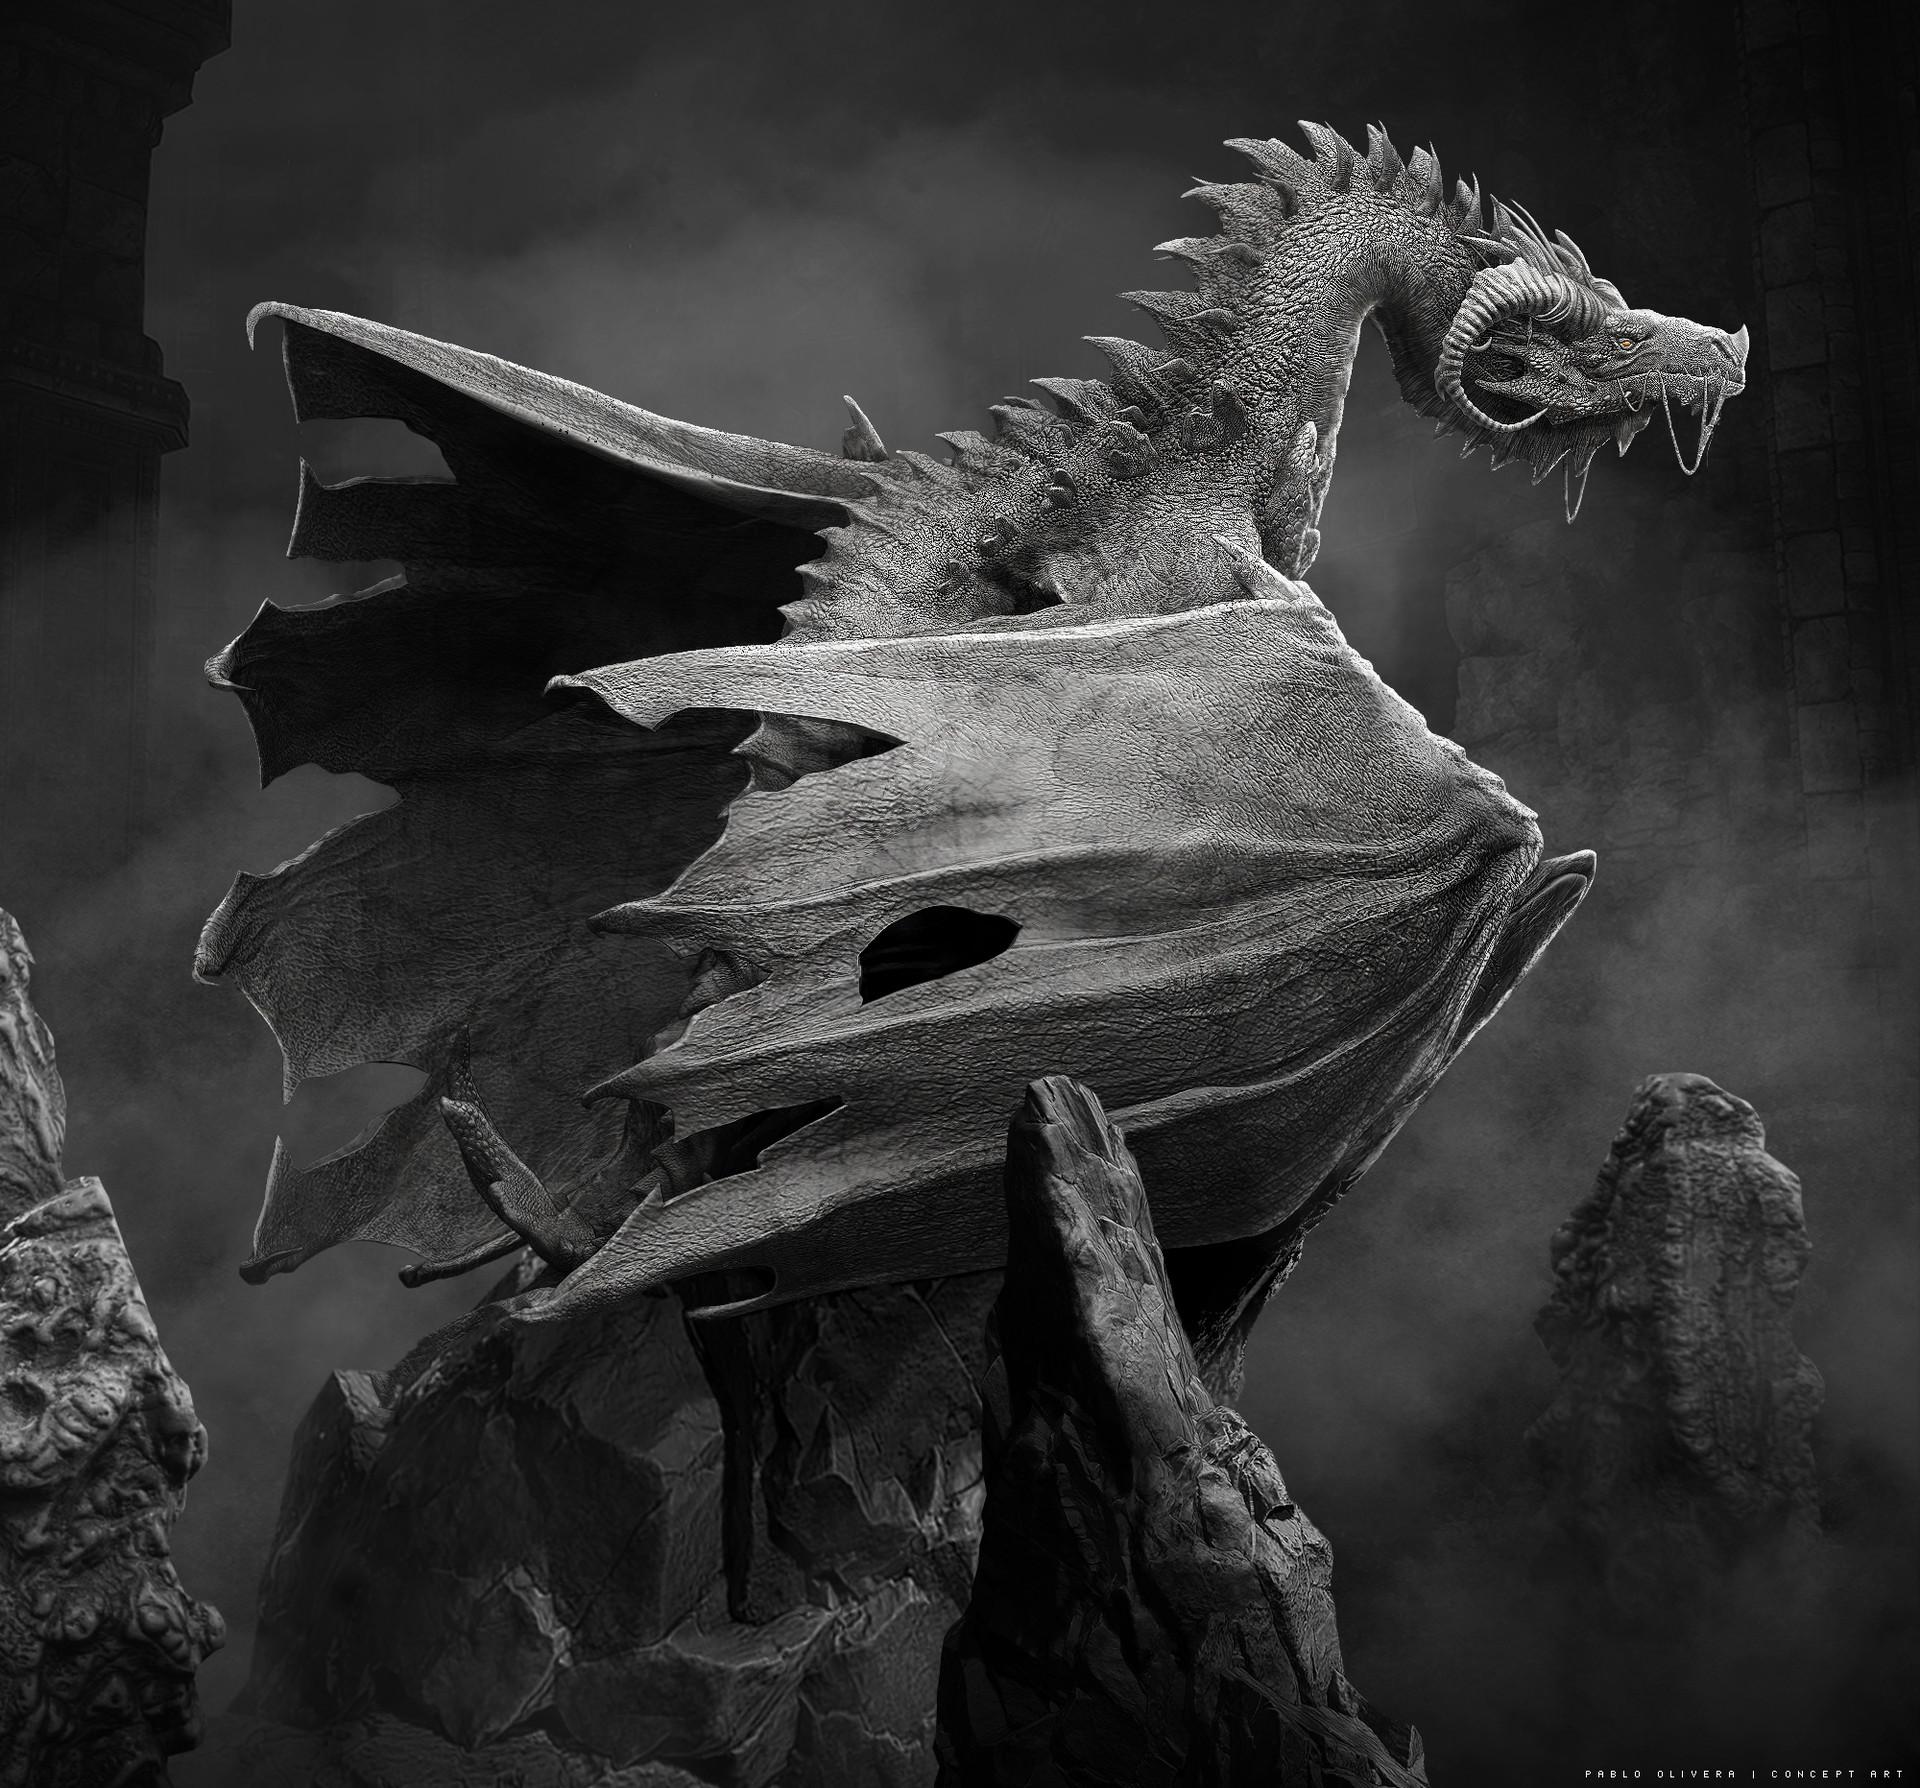 Pablo olivera dragones wacom zbrush 07 b